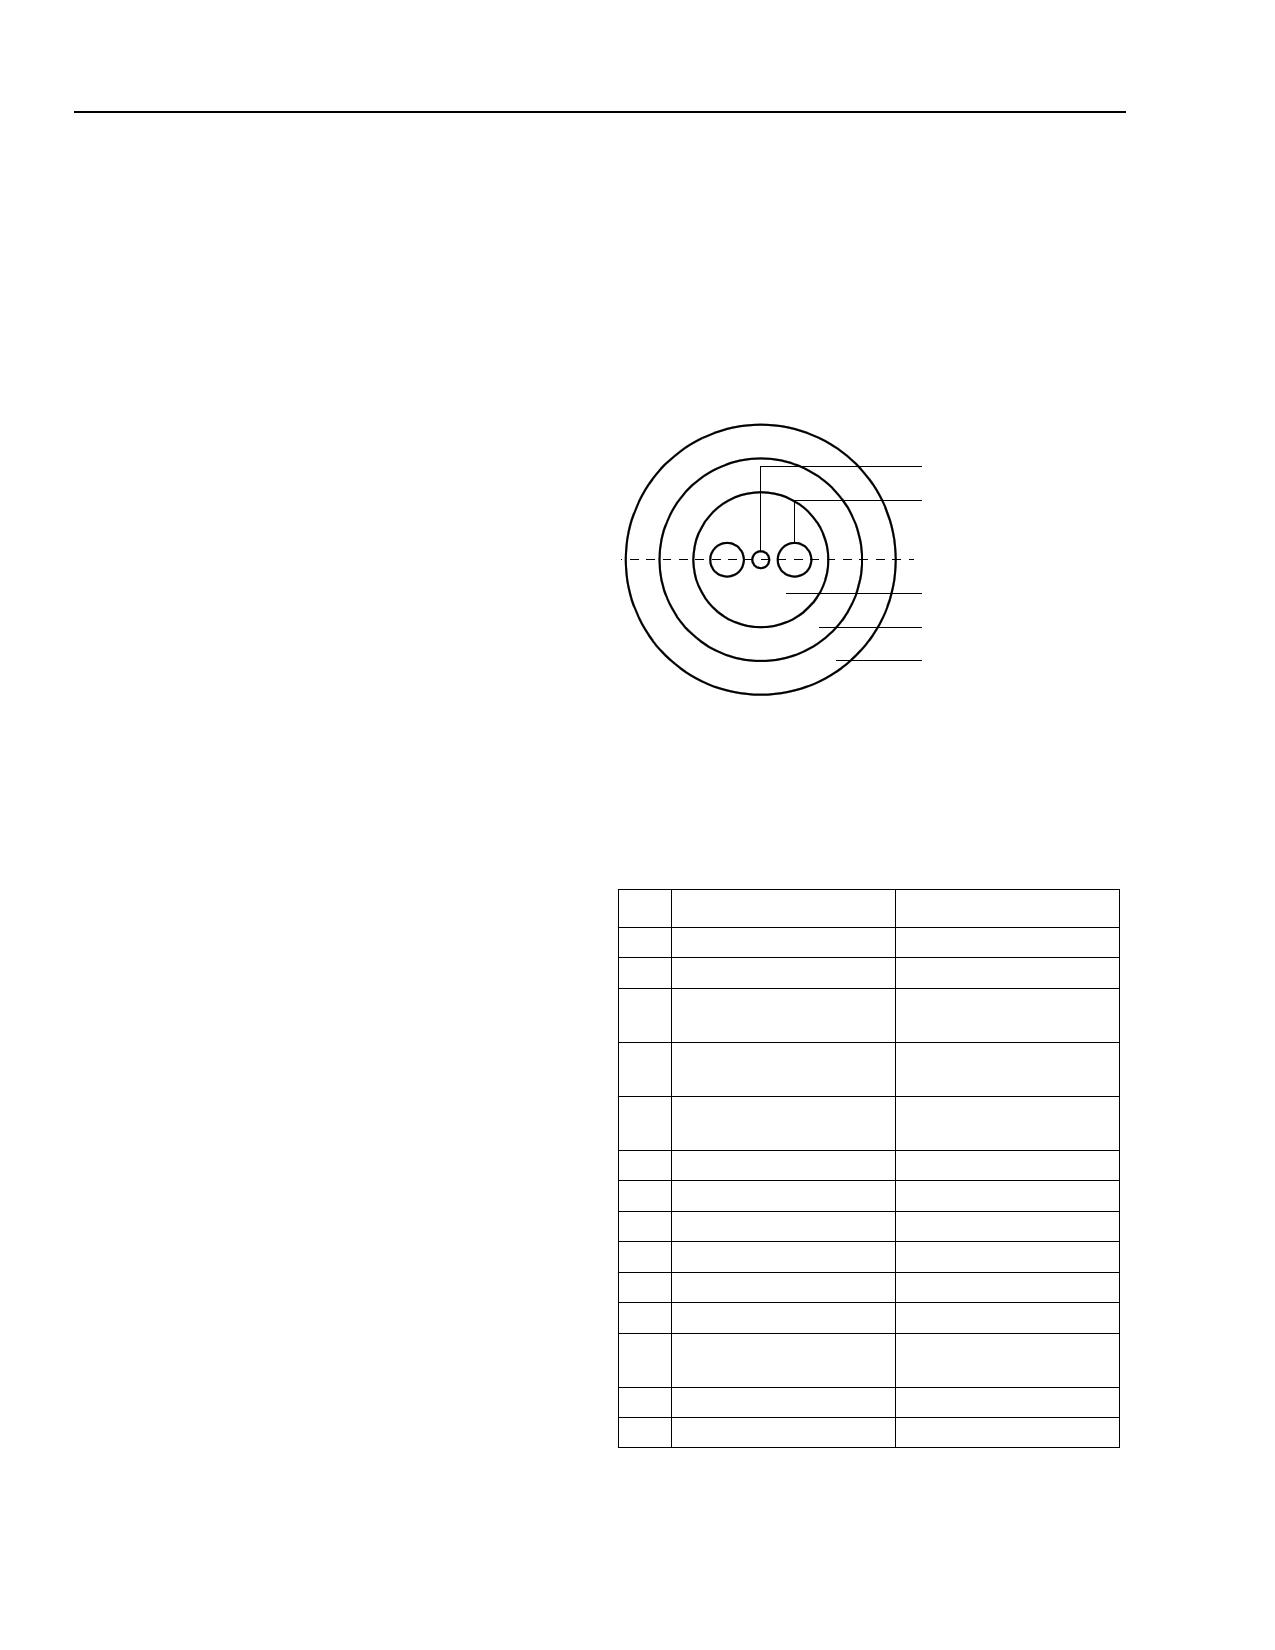 D2587P879 pdf, schematic